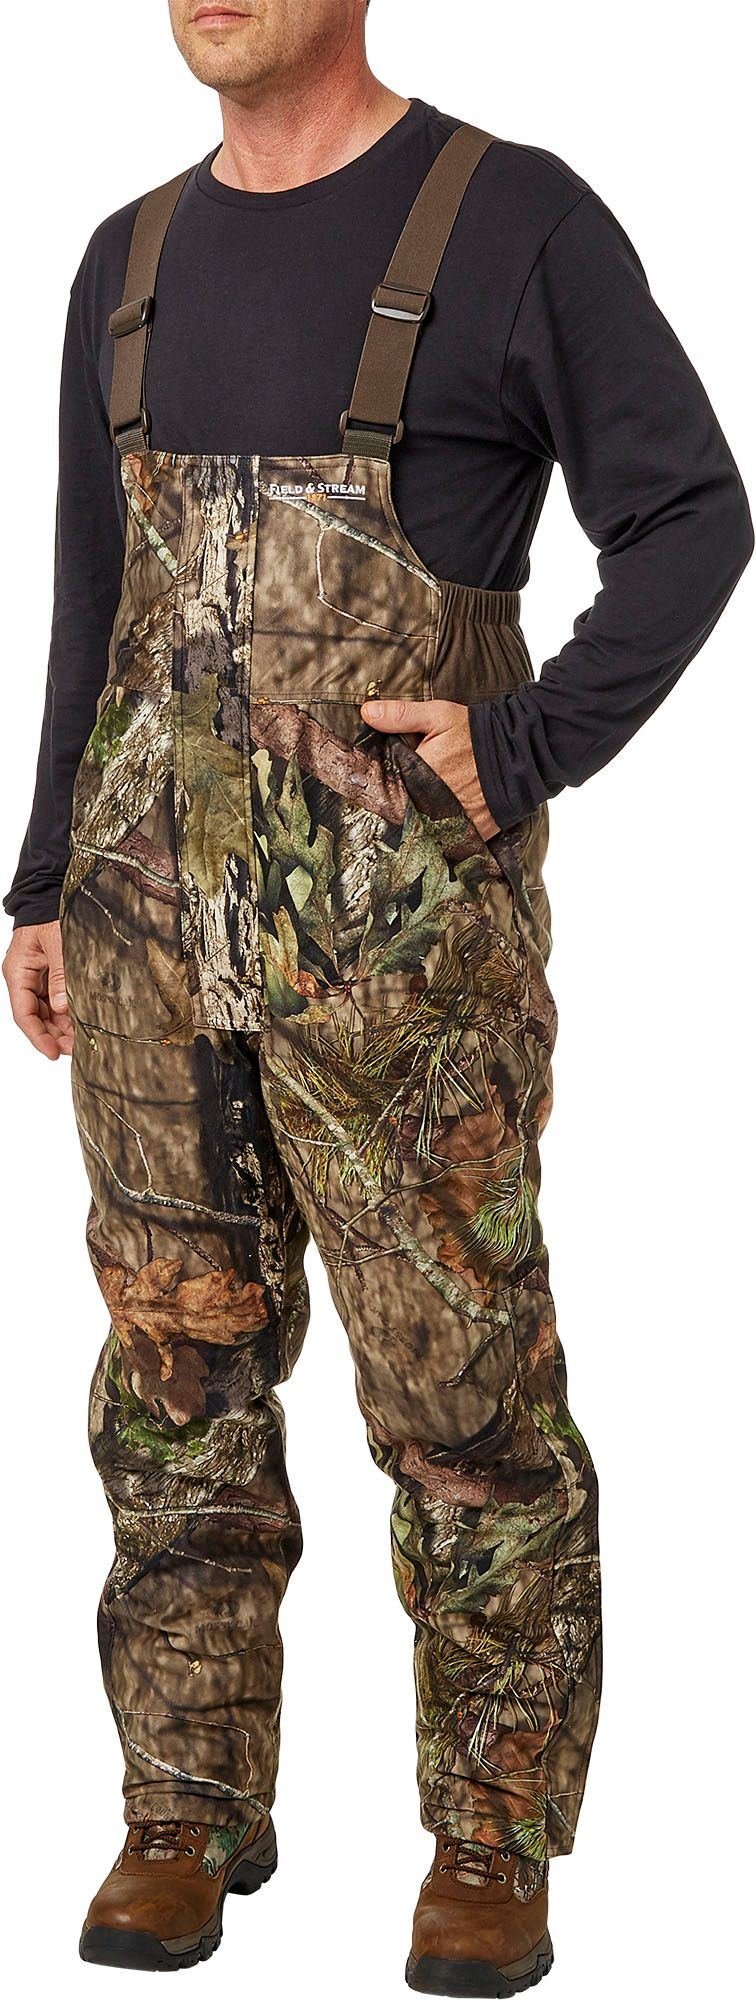 Field & Stream Men's True Pursuit Insulated Hunting Bibs, Size: Medium, Mossy Oak Country thumbnail